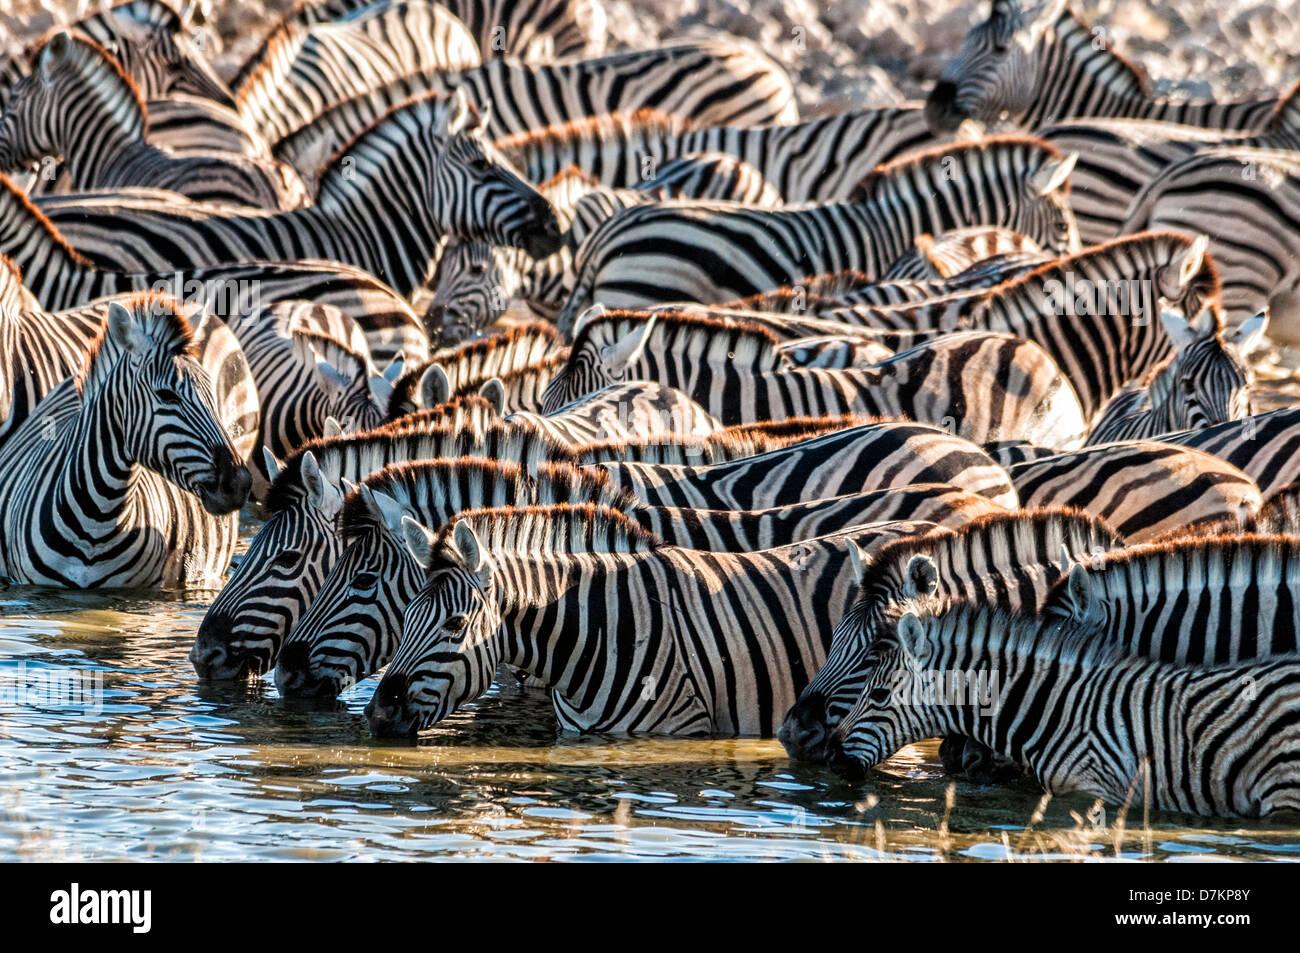 Herd or dazzle of Burchell's Zebras, Equus burchellii, drinking at the Okaukuejo waterhole, Etosha, Namibia, - Stock Image